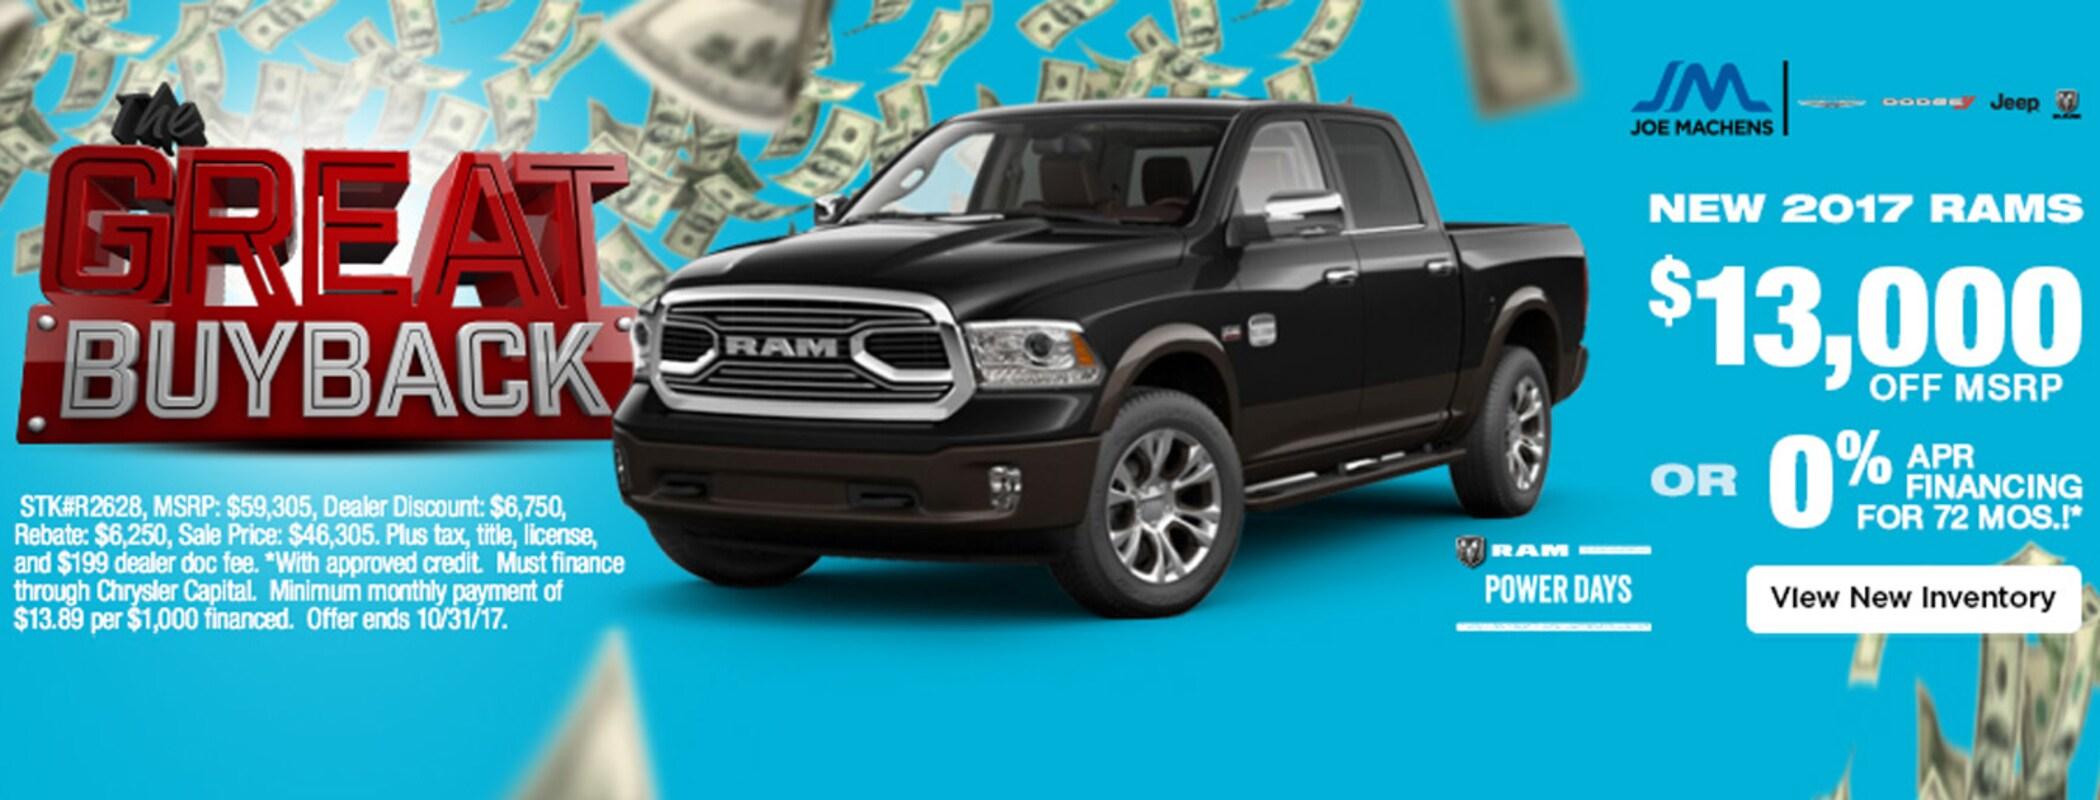 Joe machens chrysler dodge jeep ram new chrysler dodge jeep ram dealership in columbia mo 65202